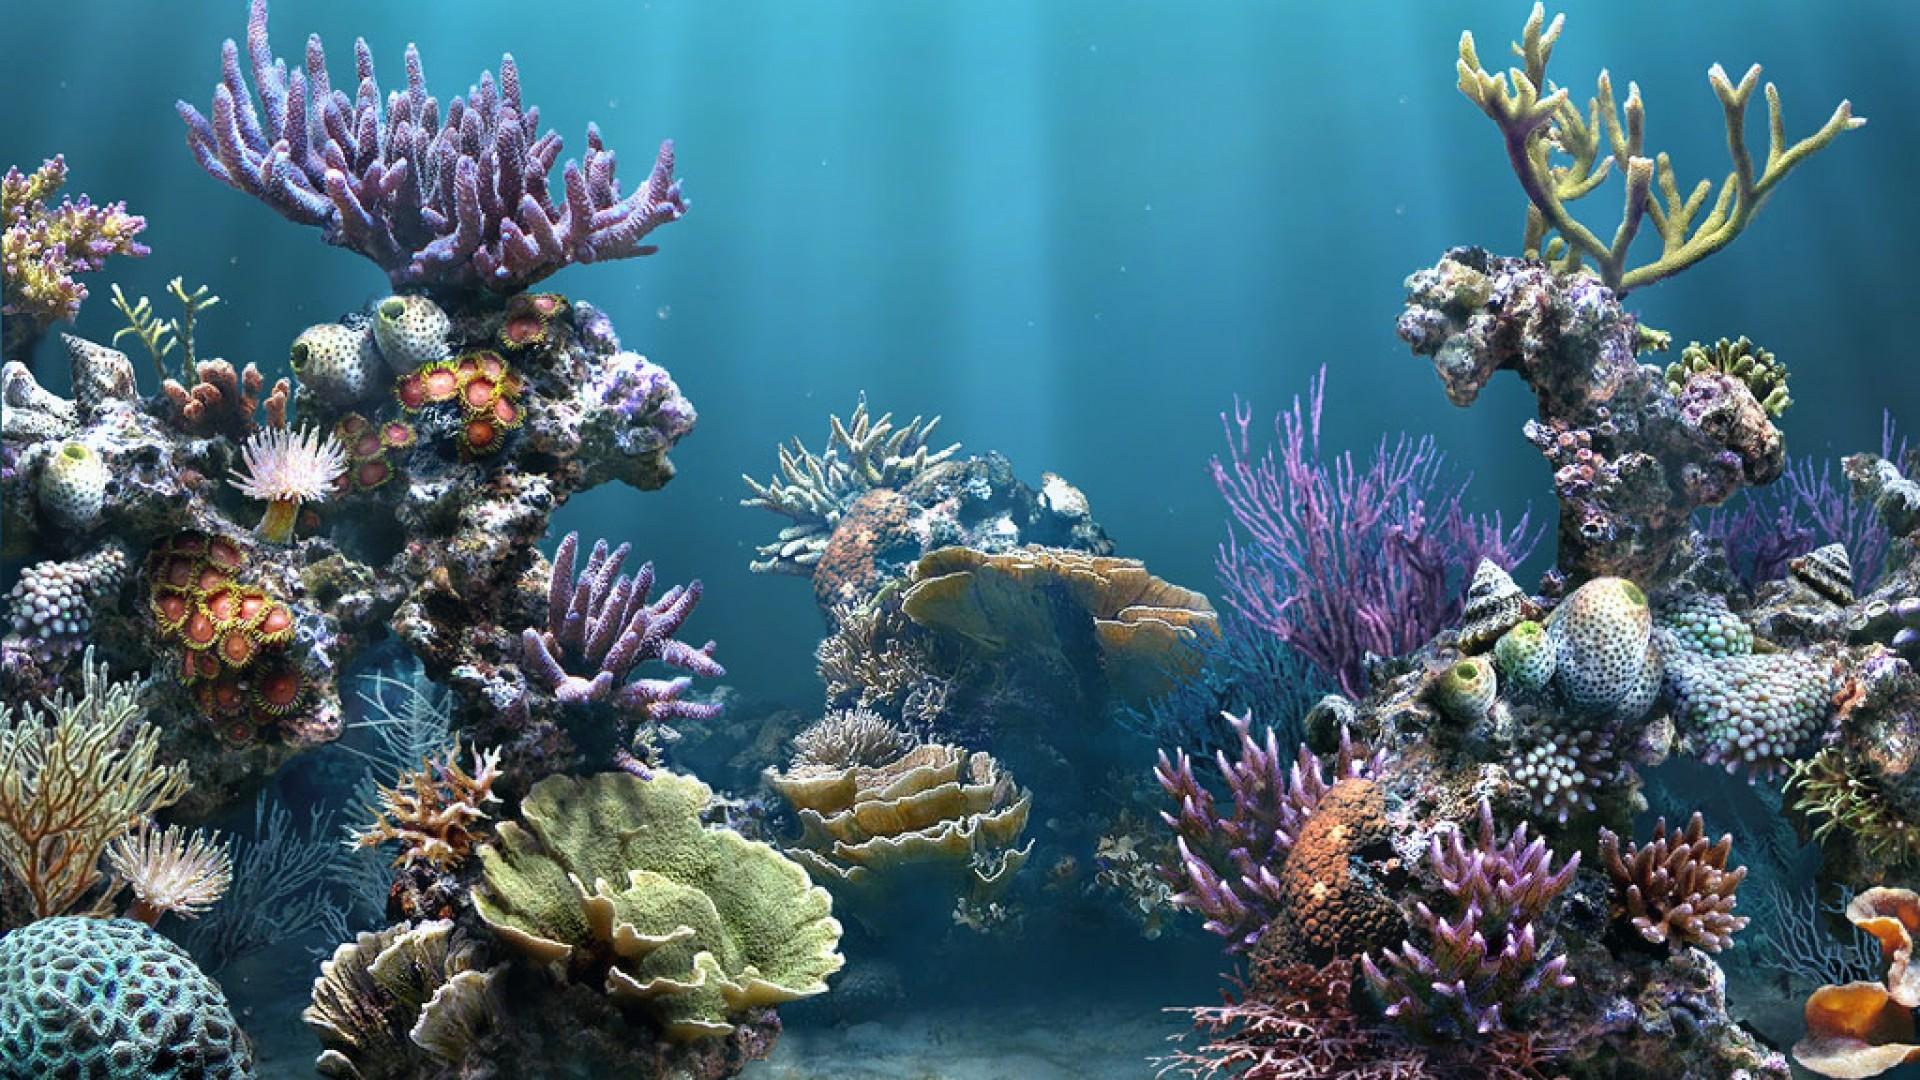 Coral reef wallpaper | 1920x1080 | 232408 | WallpaperUP